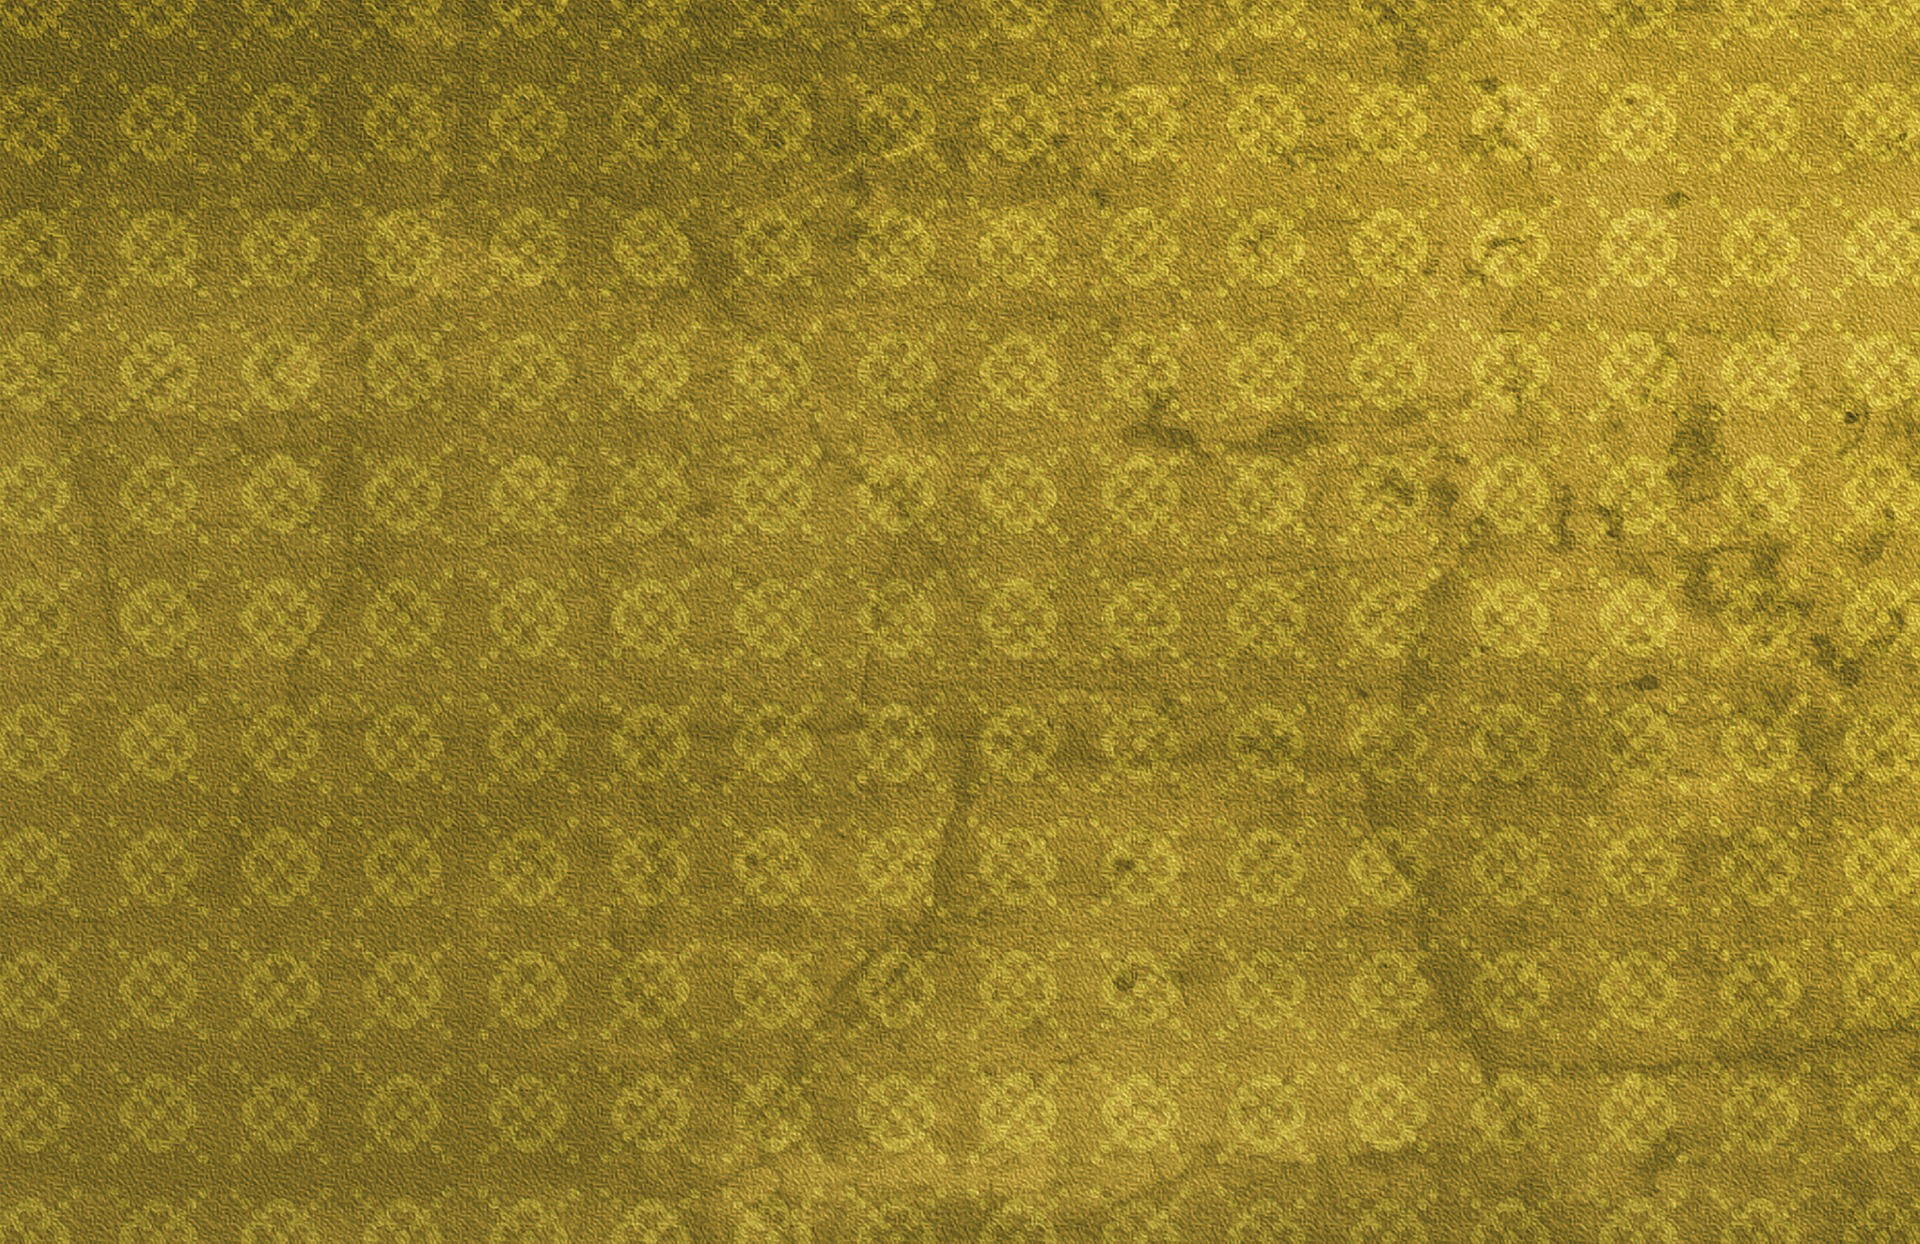 28 Synopsis Of The Yellow Wallpaper On Wallpapersafari